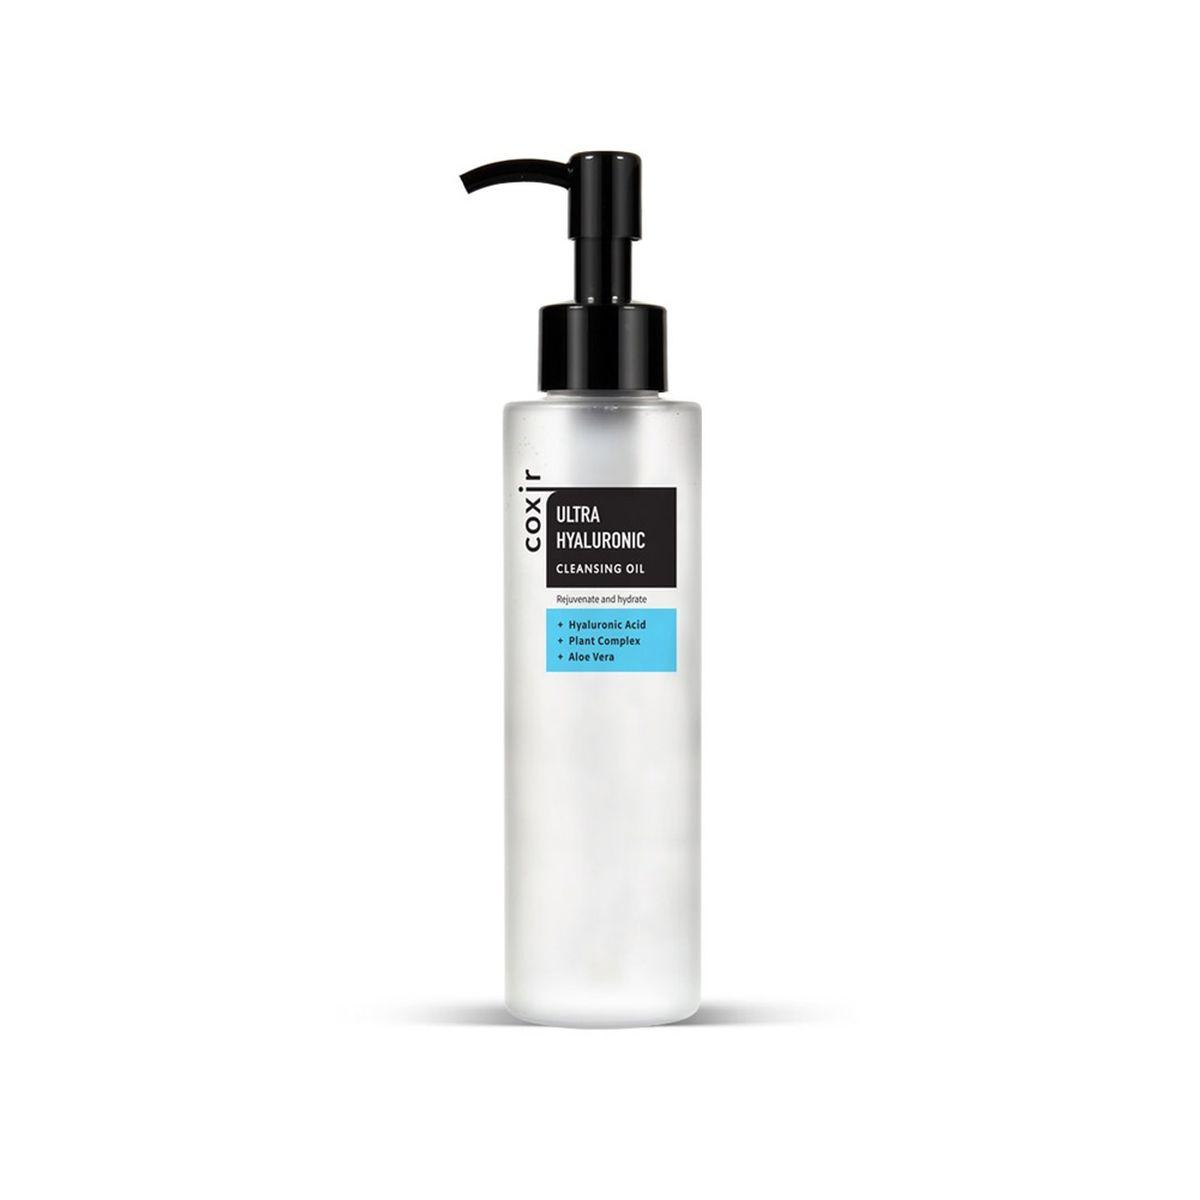 Увлажняющее гидрофильное масло COXIR Ultra Hyaluronic Cleansing Oil - 150 мл